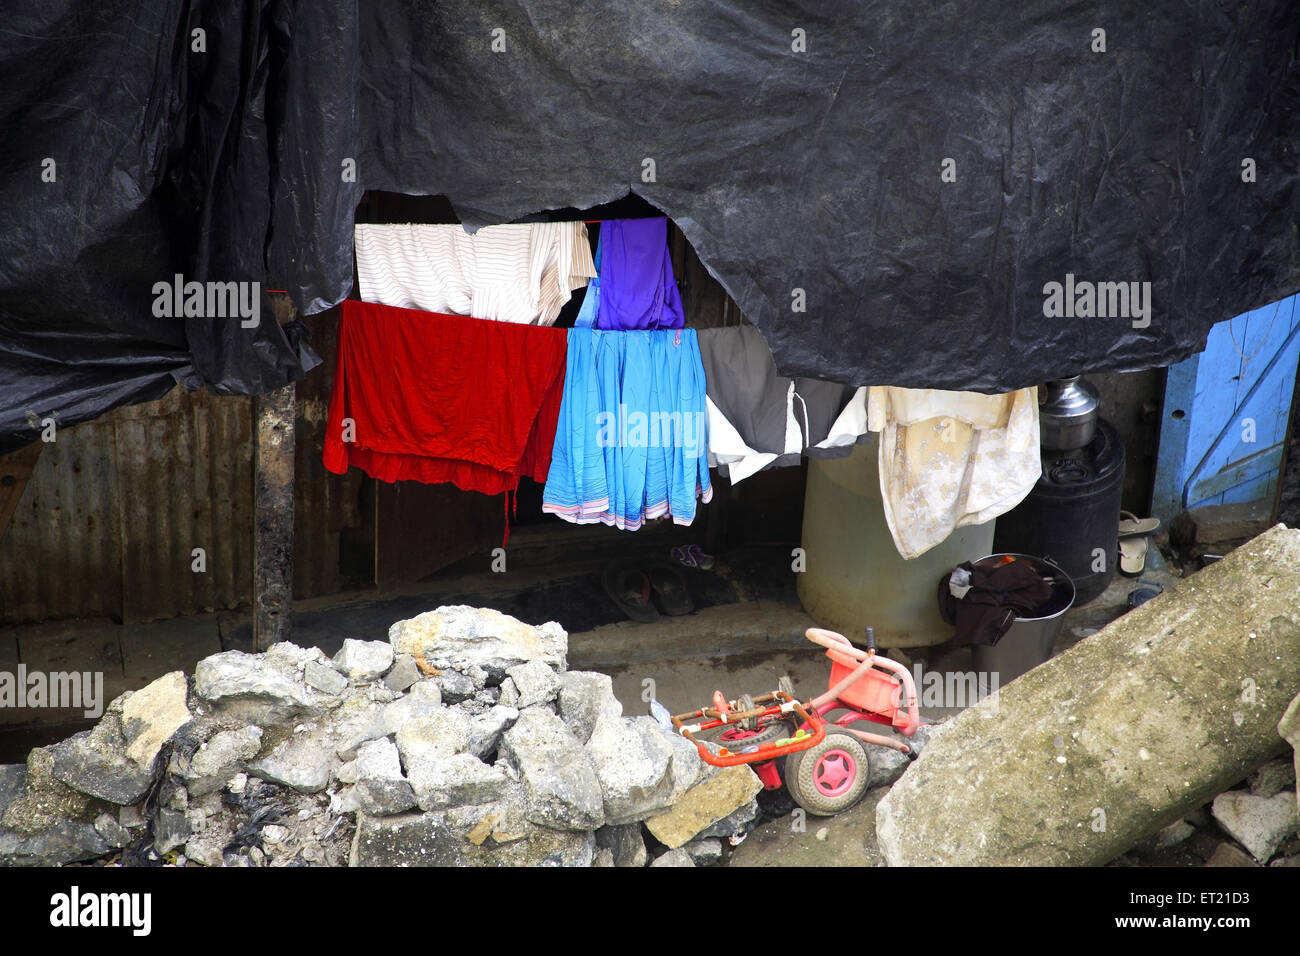 Il foglio di plastica Asciugando panno e detriti negli slum ; Behram Naupada ; Anant Kanekar Marg ; Bandra ; Mumbai Foto Stock